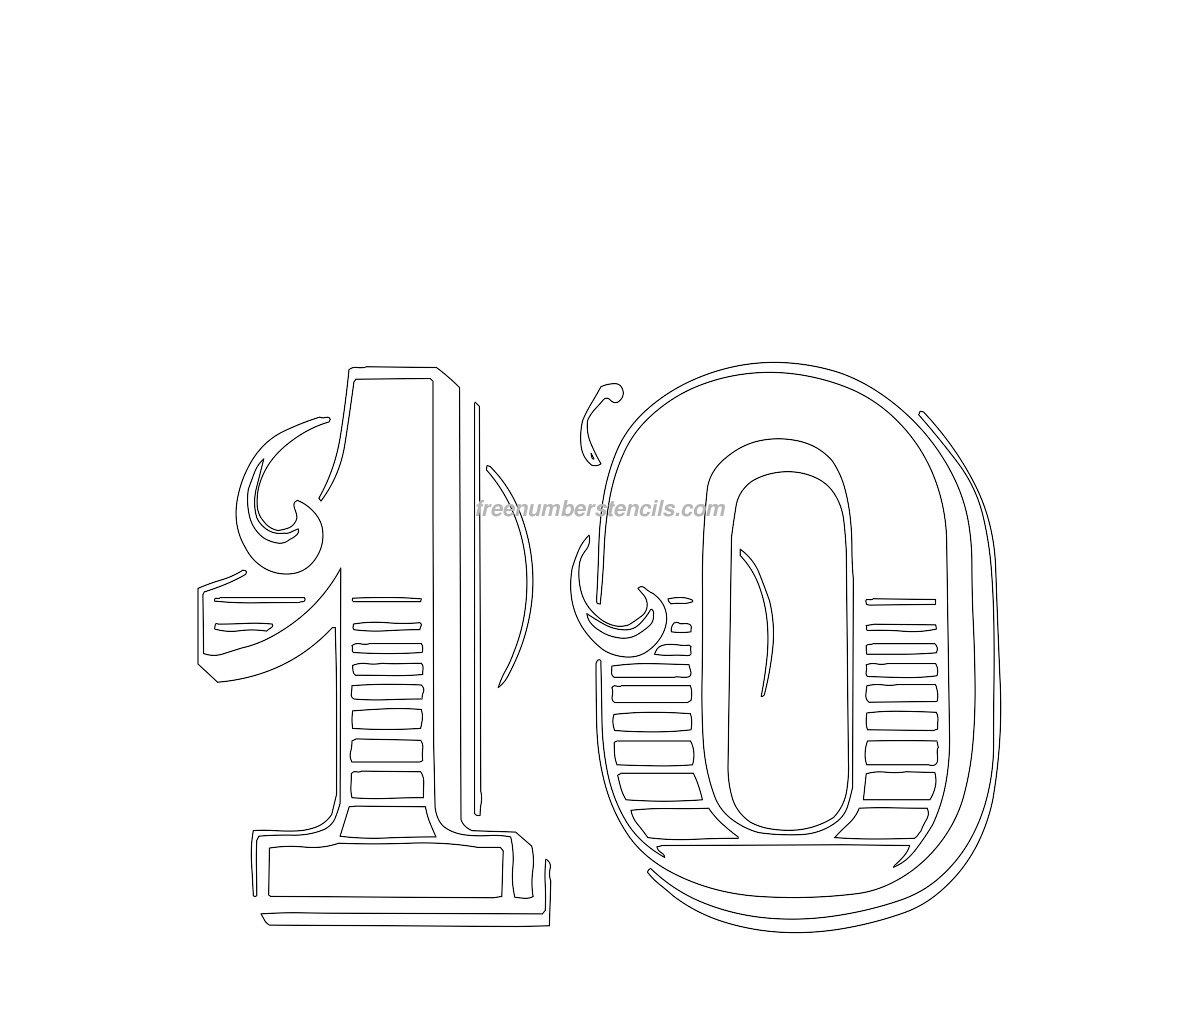 Image decorative number stencils download